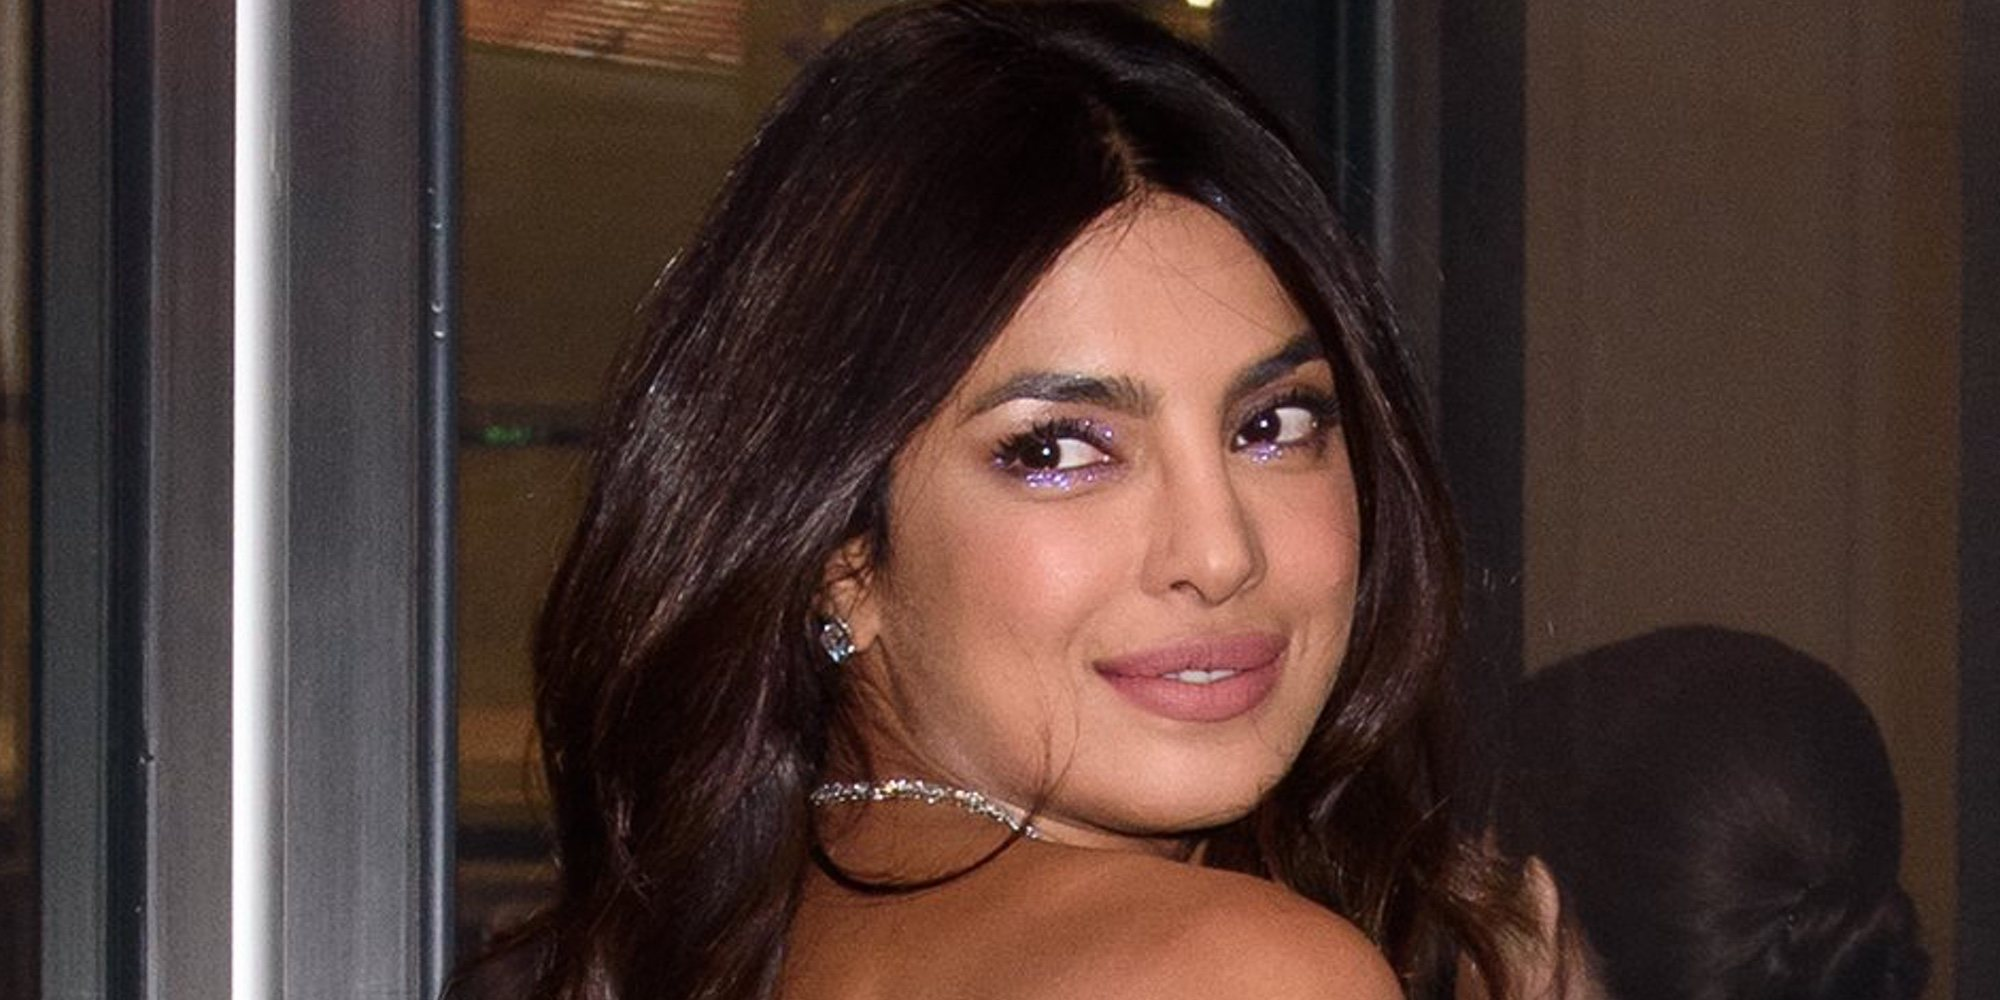 Priyanka Chopra da detalles sobre la boda sorpresa de Joe Jonas y Sophie Turner